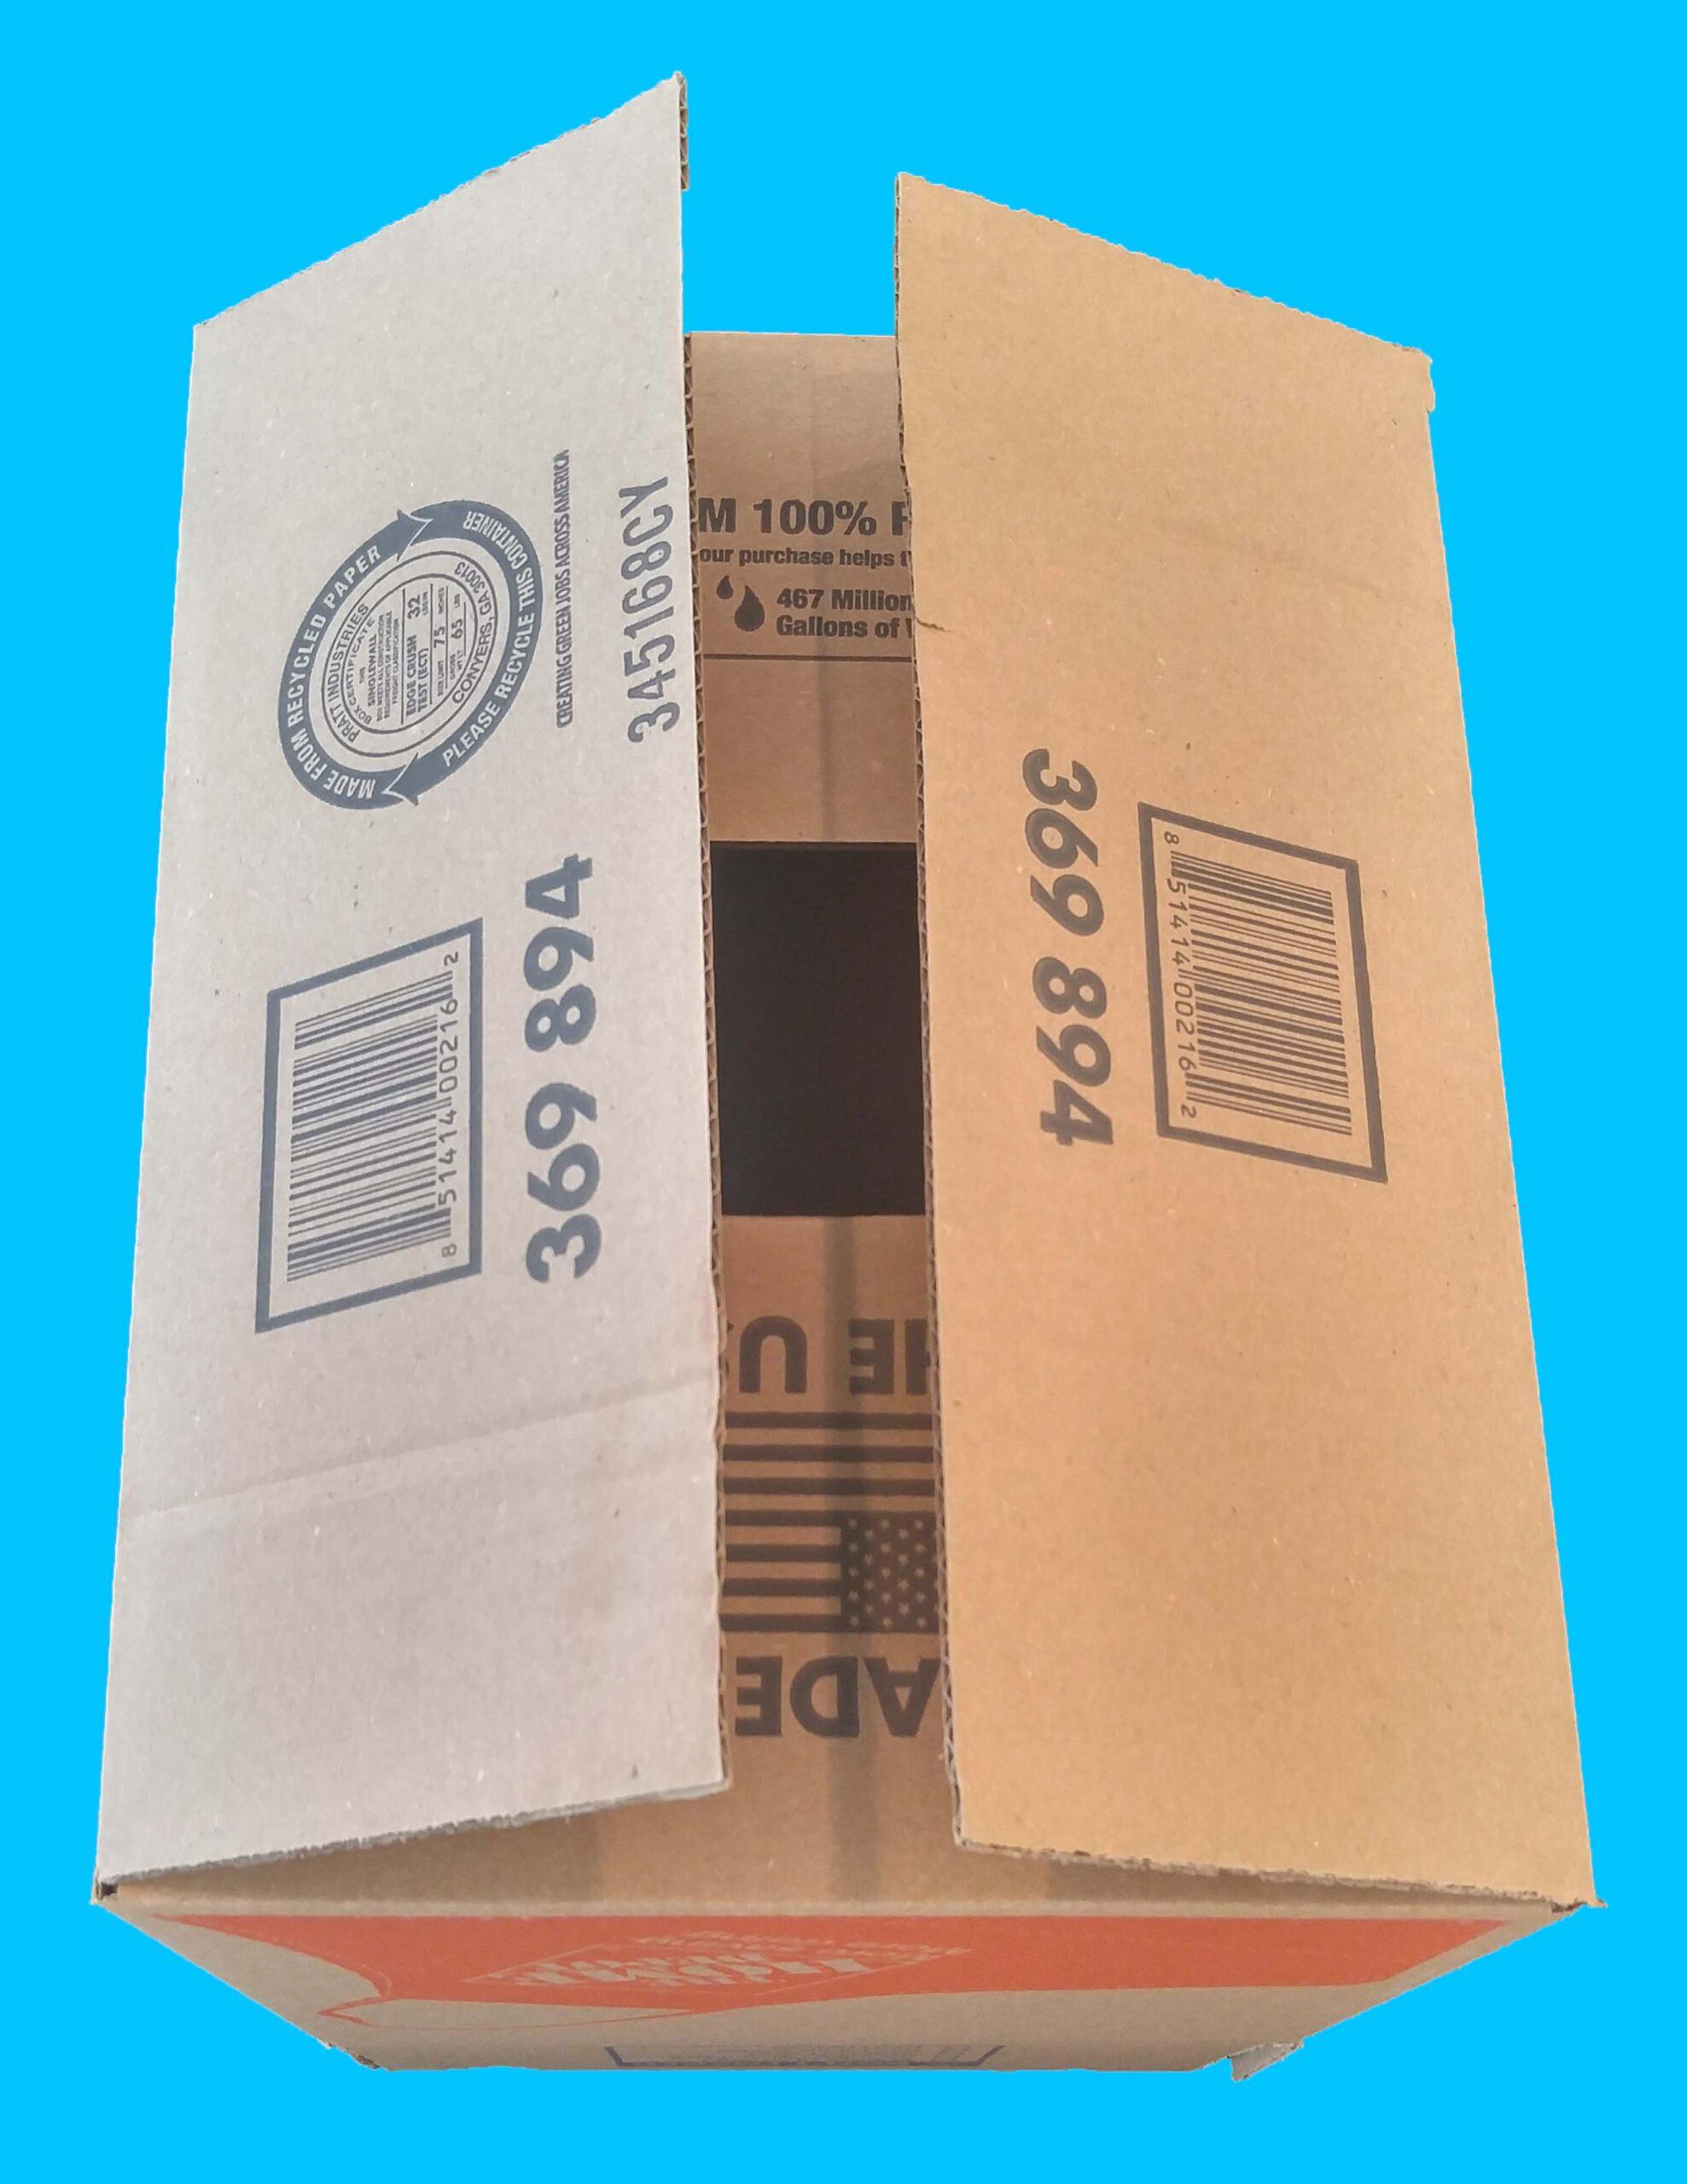 Cardboard box bottom need to close